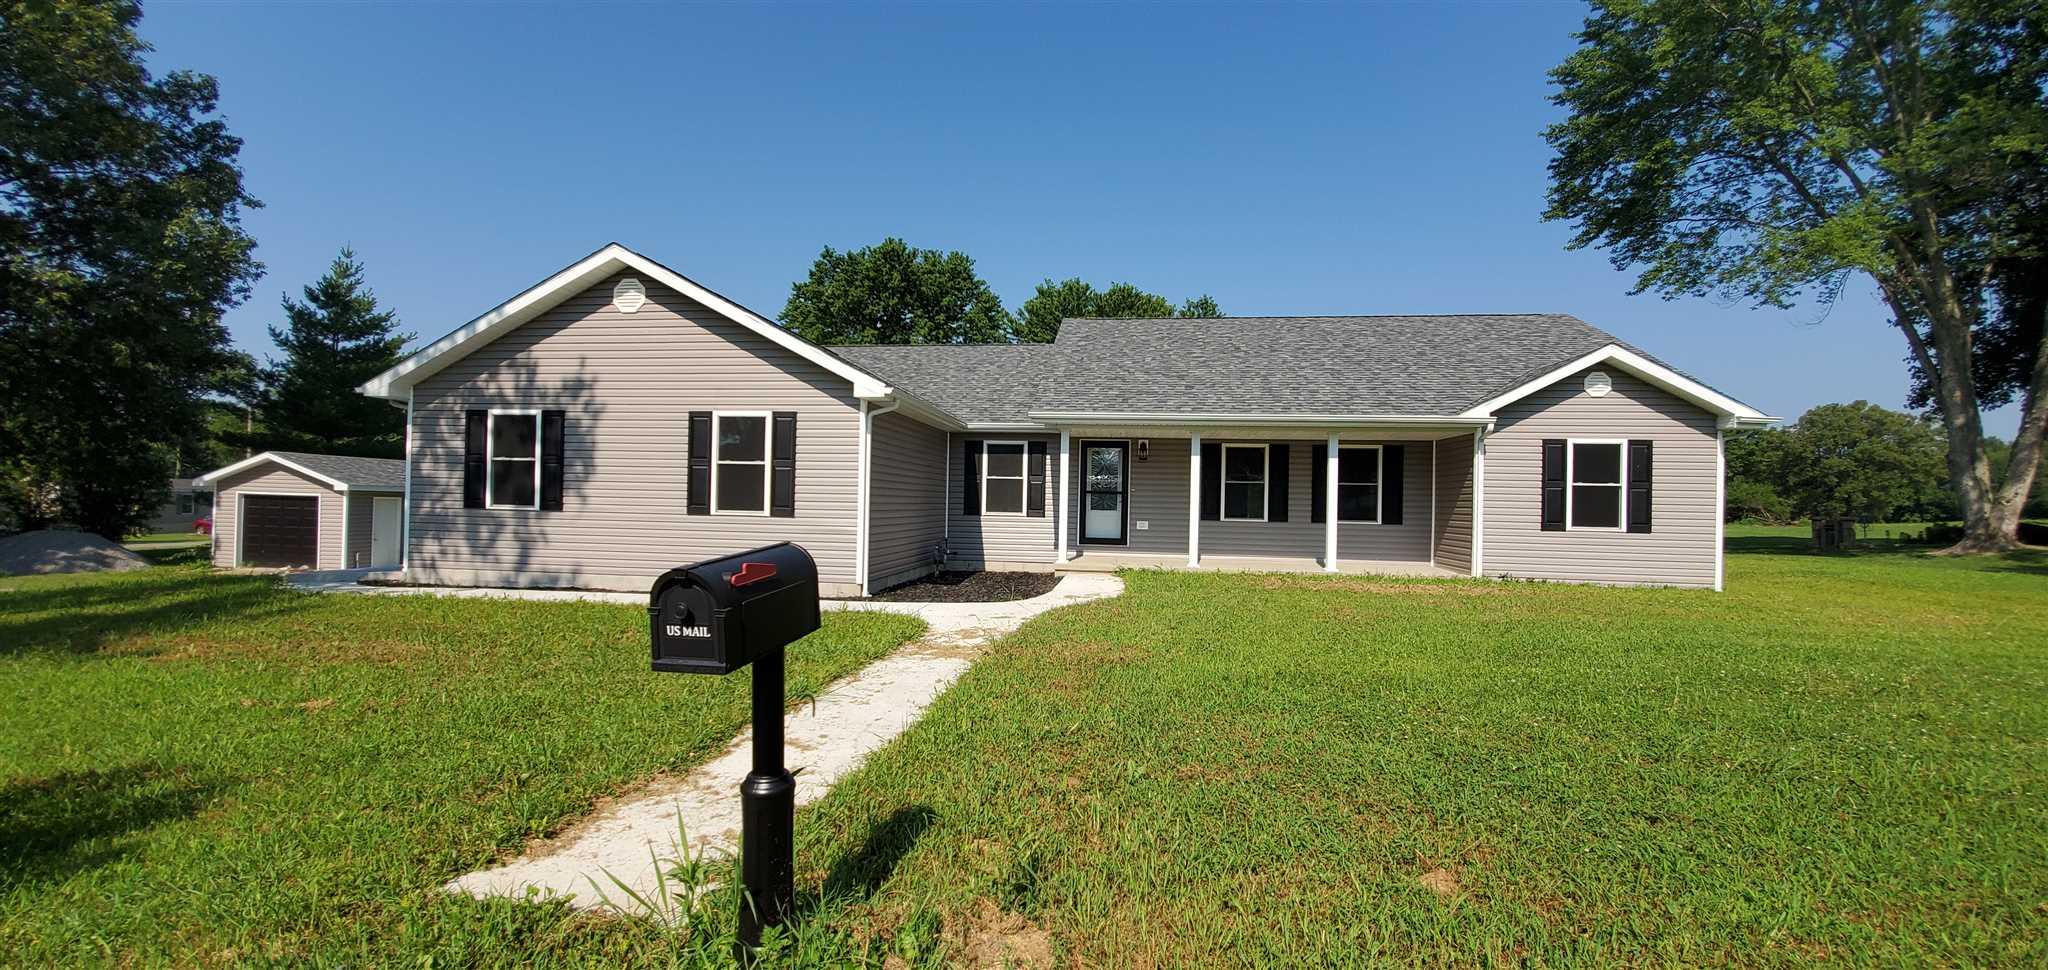 1009 TROLLEY Property Photo - Eldorado, IL real estate listing